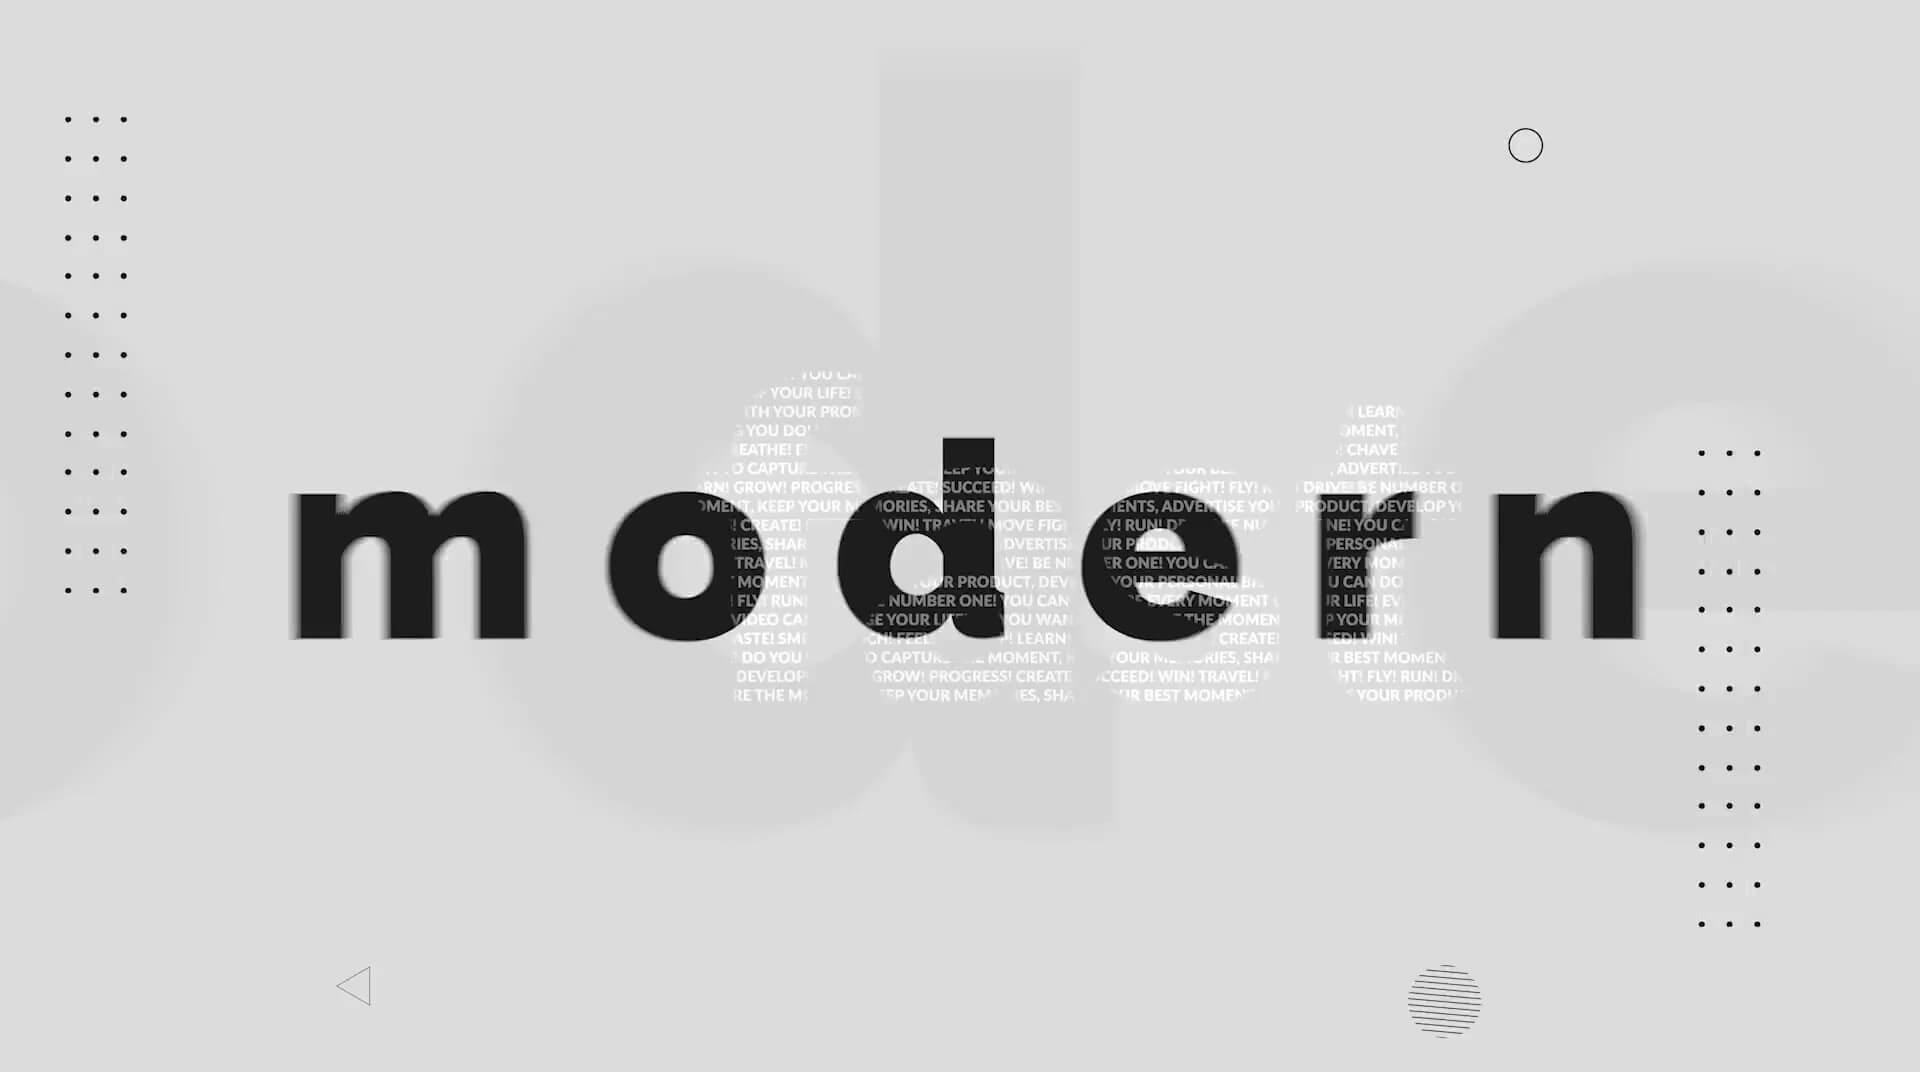 fcpx片头模板 时尚活力快闪卡点节奏感主题预告片模板 Typography Opener